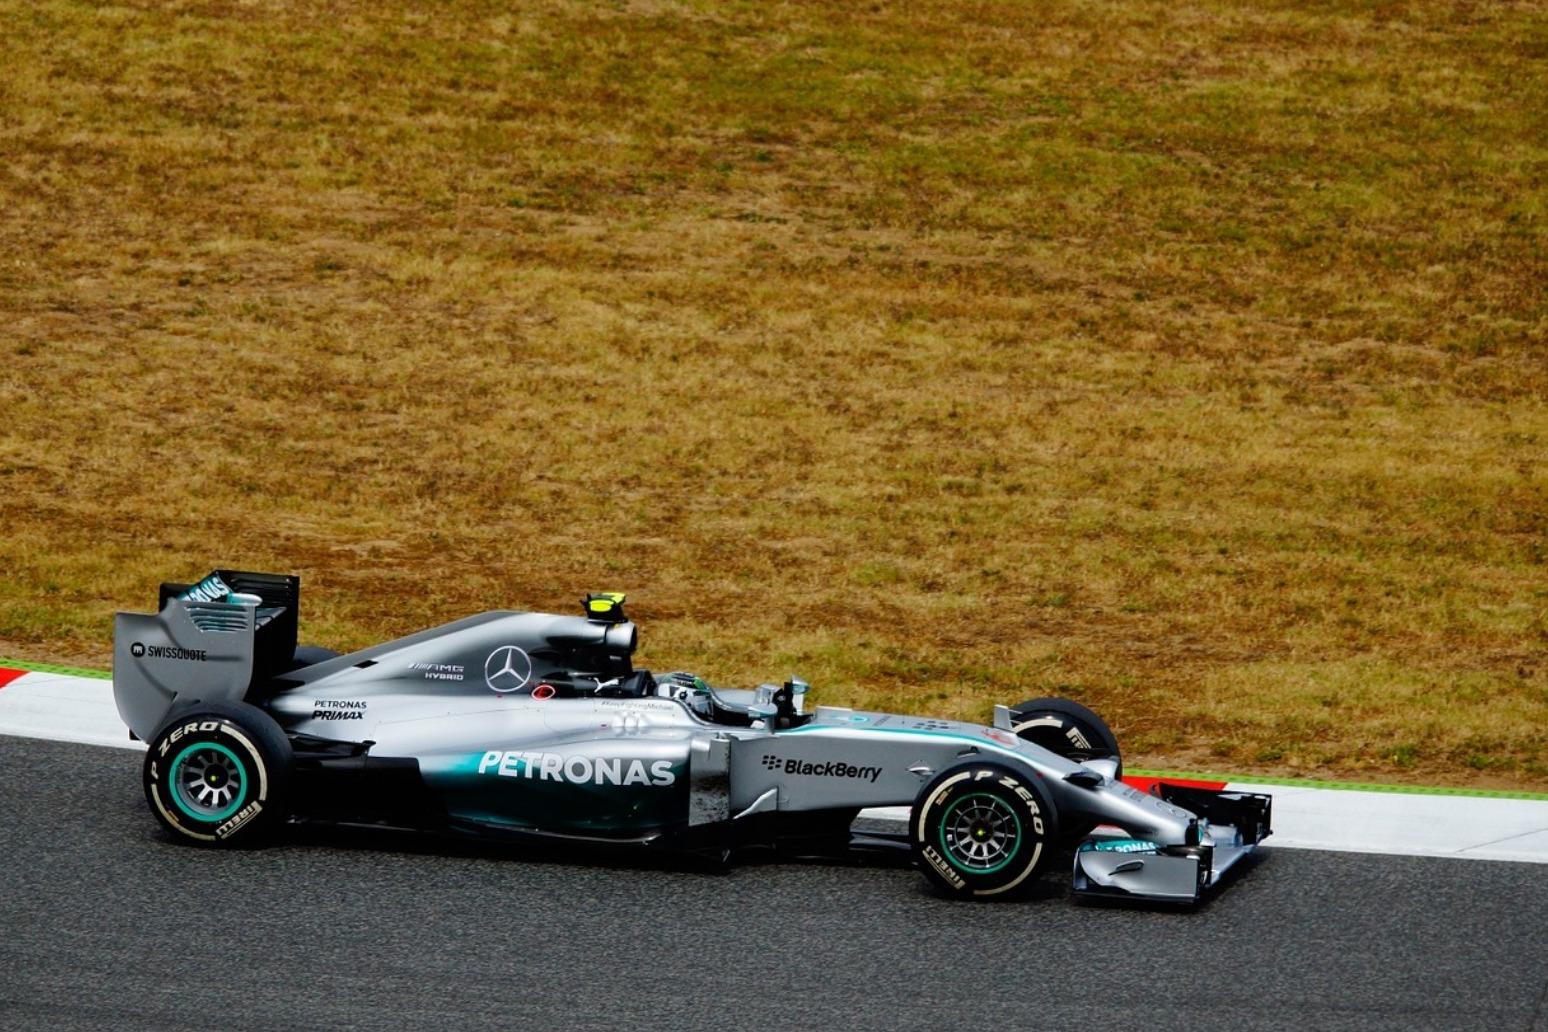 Formula 1 Pre-season testing continues in Spain